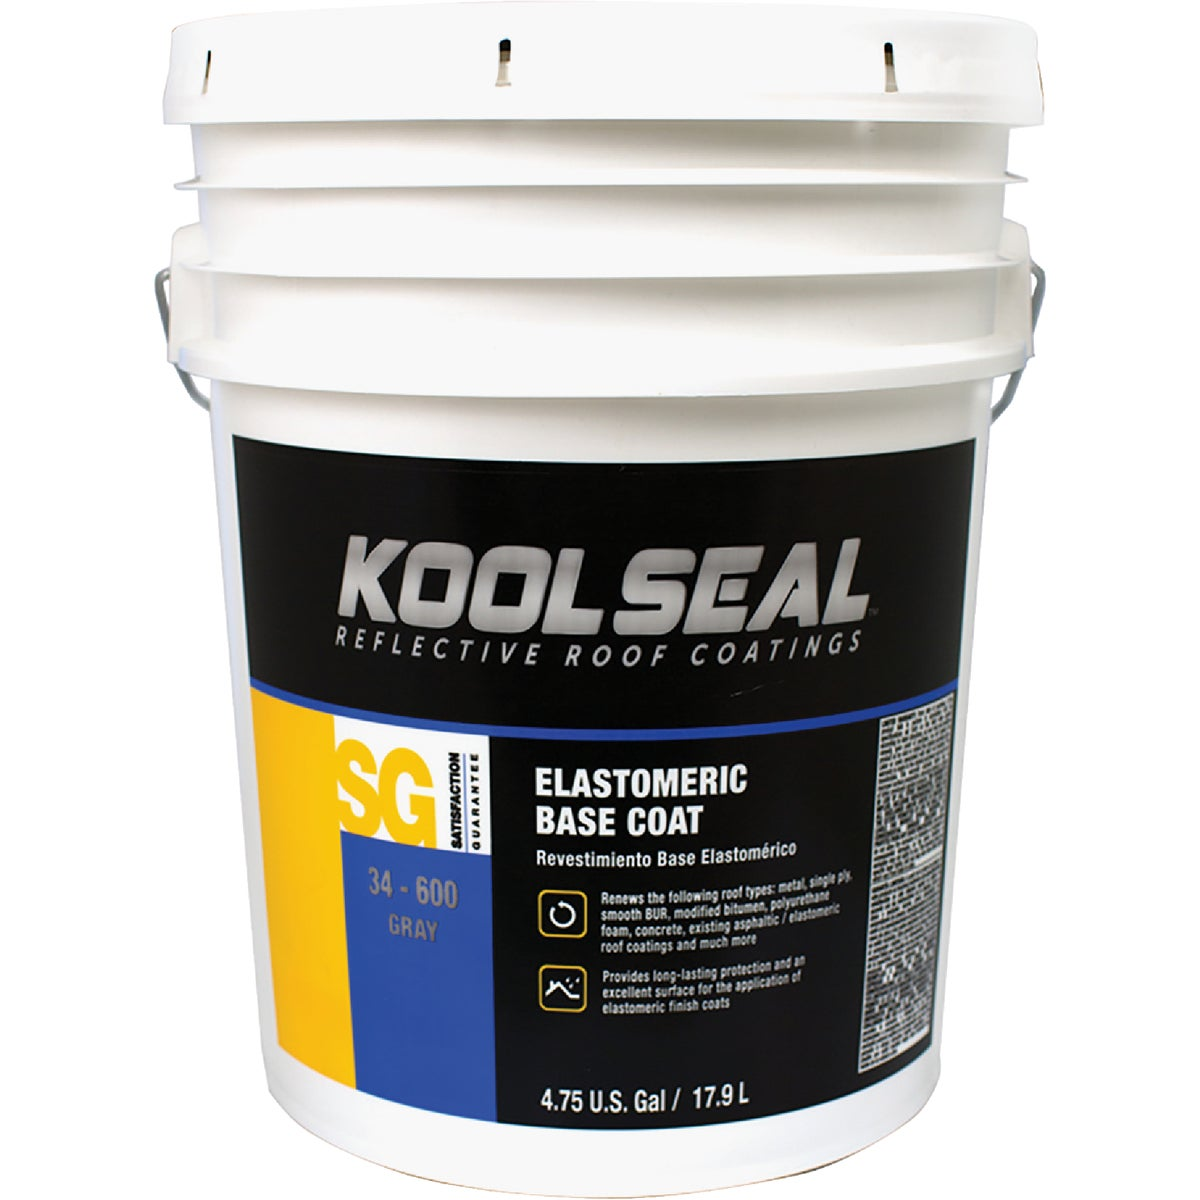 GRY ELASTOMERIC PRIMER - KS0034600-20 by Kool Seal